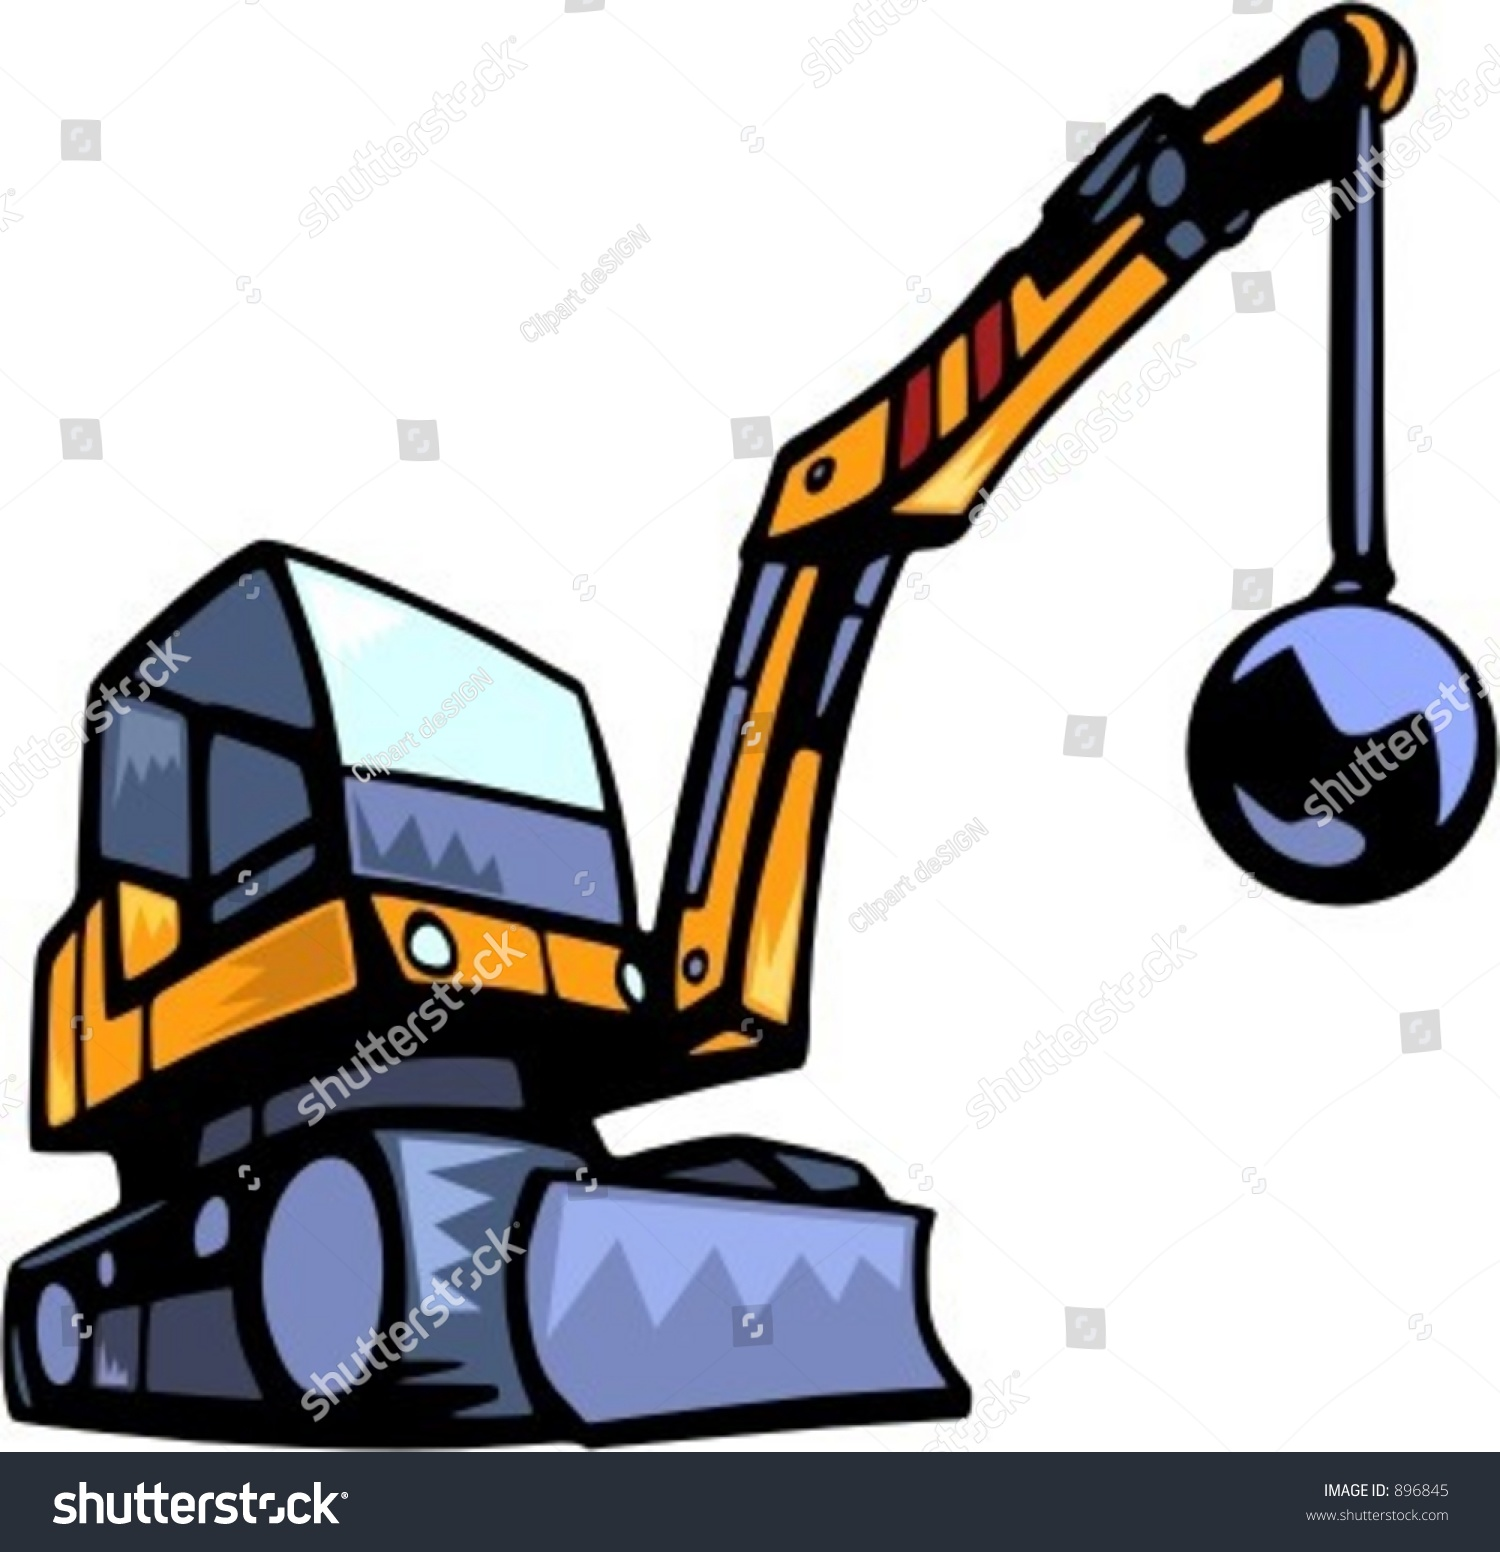 Building Demolition Cartoon : Demolition vehiclevector illustration stock vector